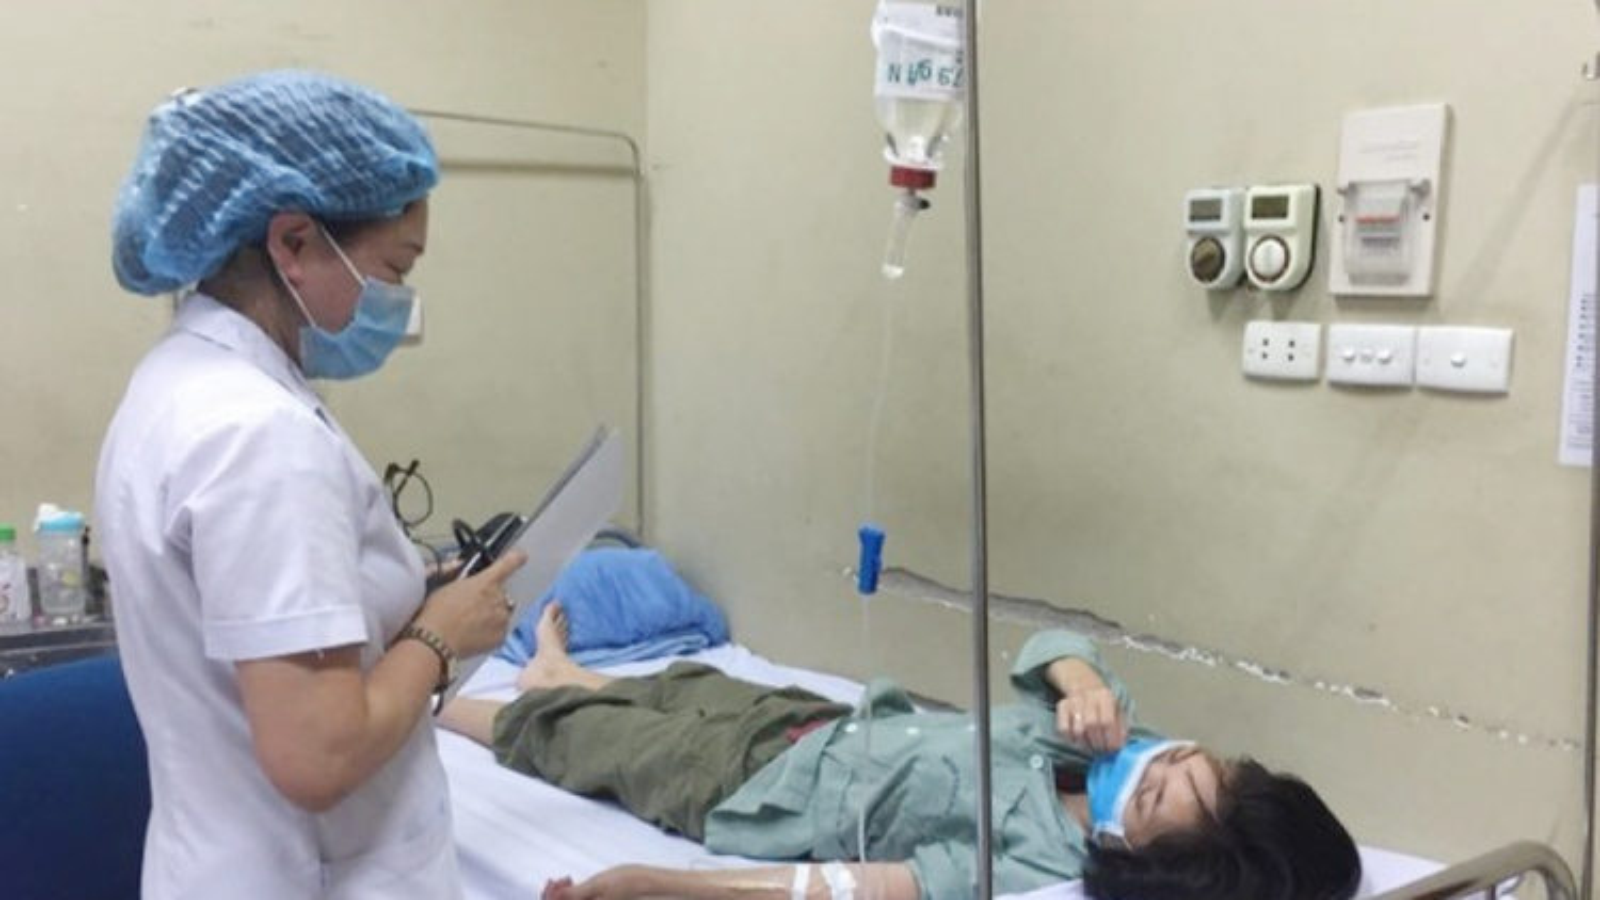 Khanh Hoa province sees rise in dengue fever cases